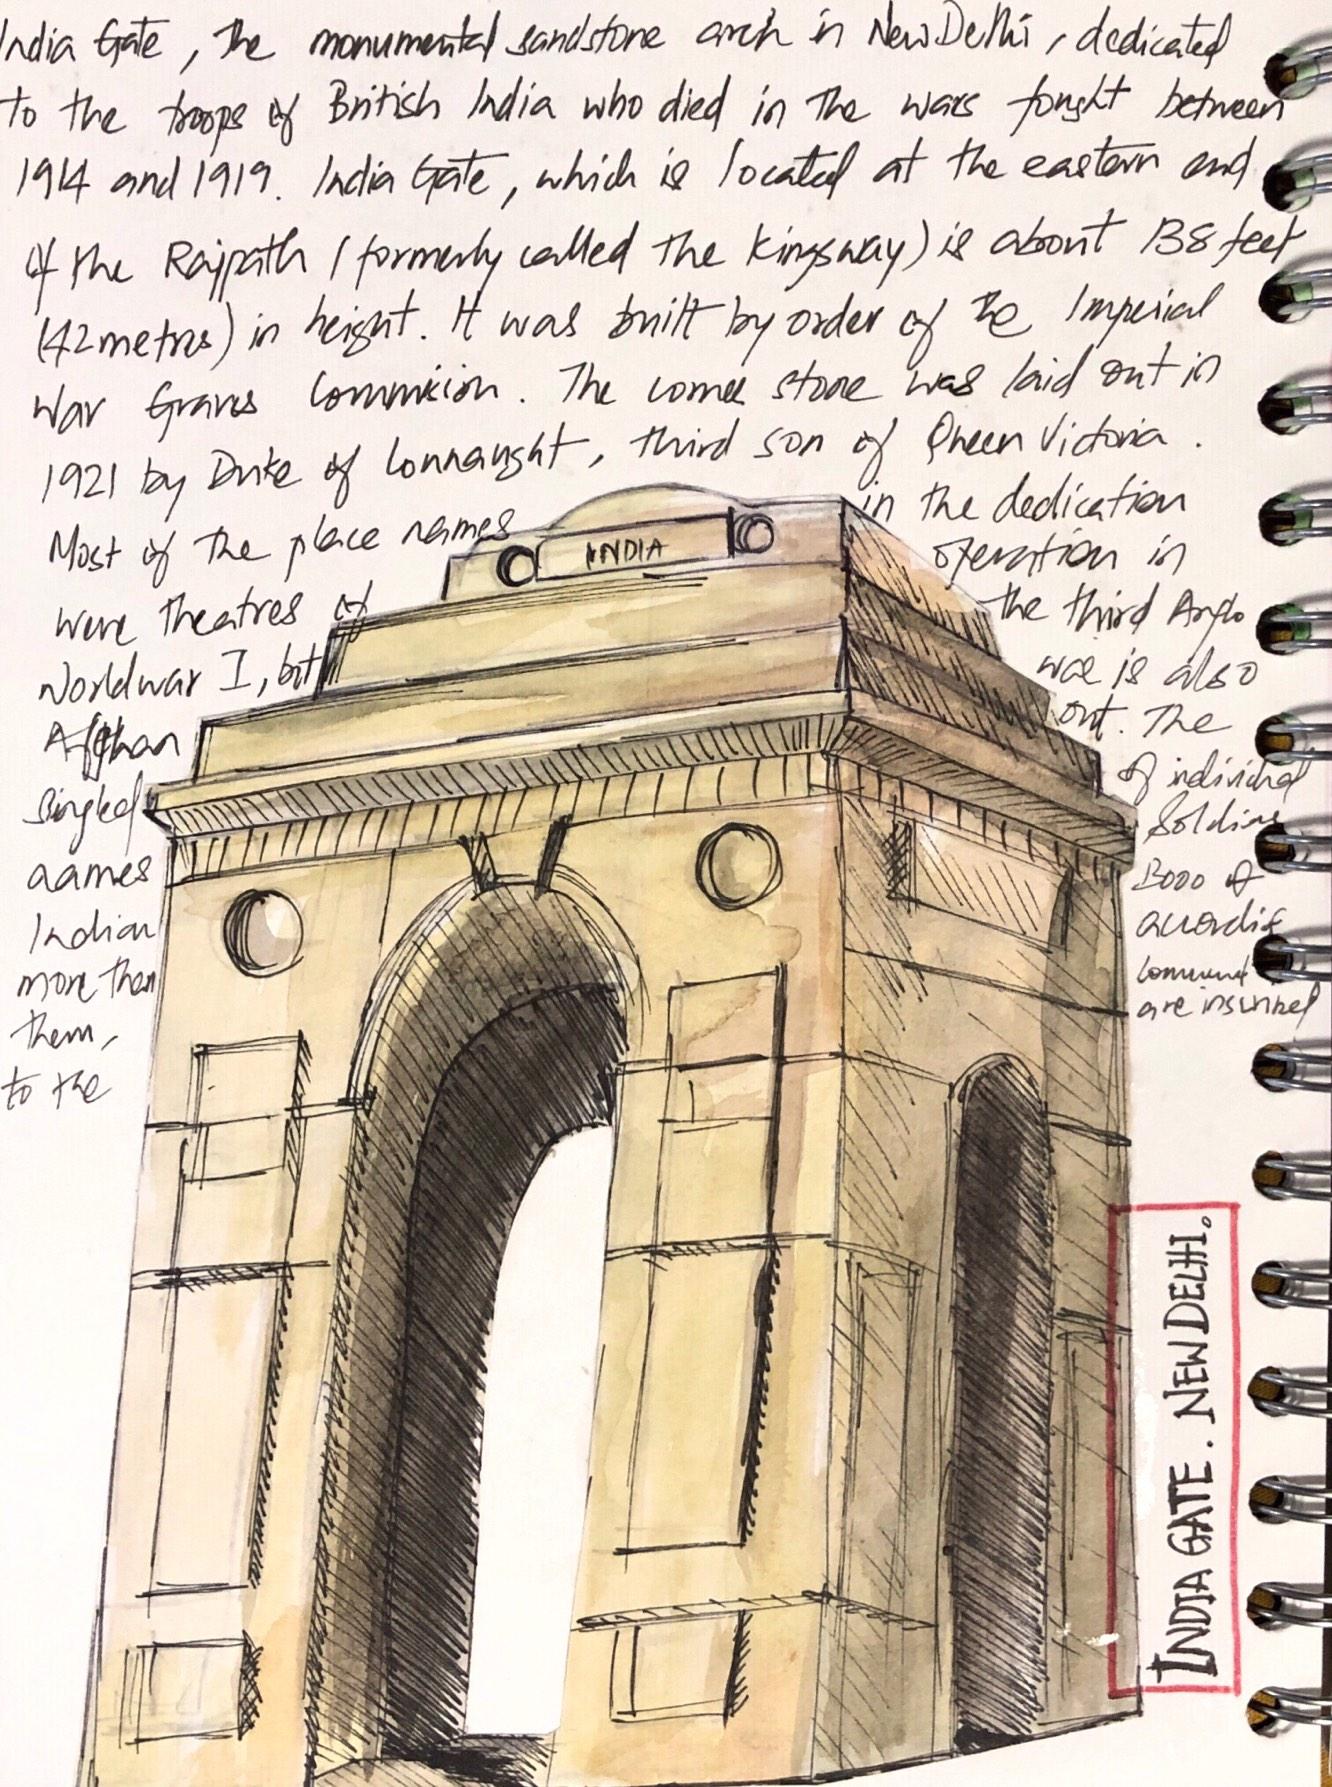 India-gate-delhi-sketch.jpg